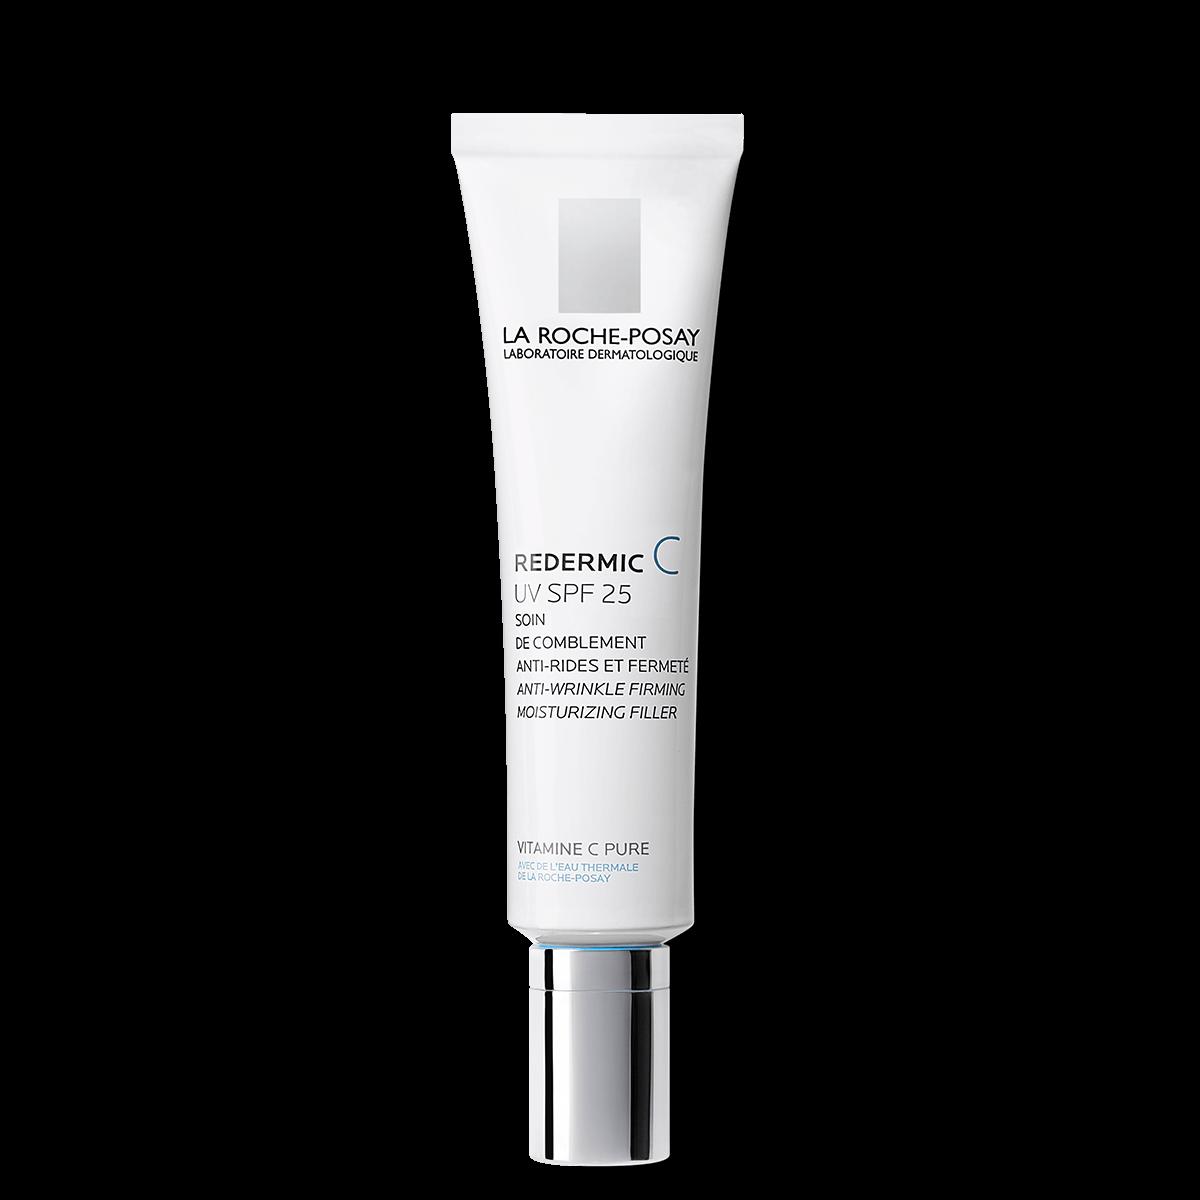 LaRoche Posay ProductPage Anti Aging Cream Redermic C UV Spf25 Anti Wr